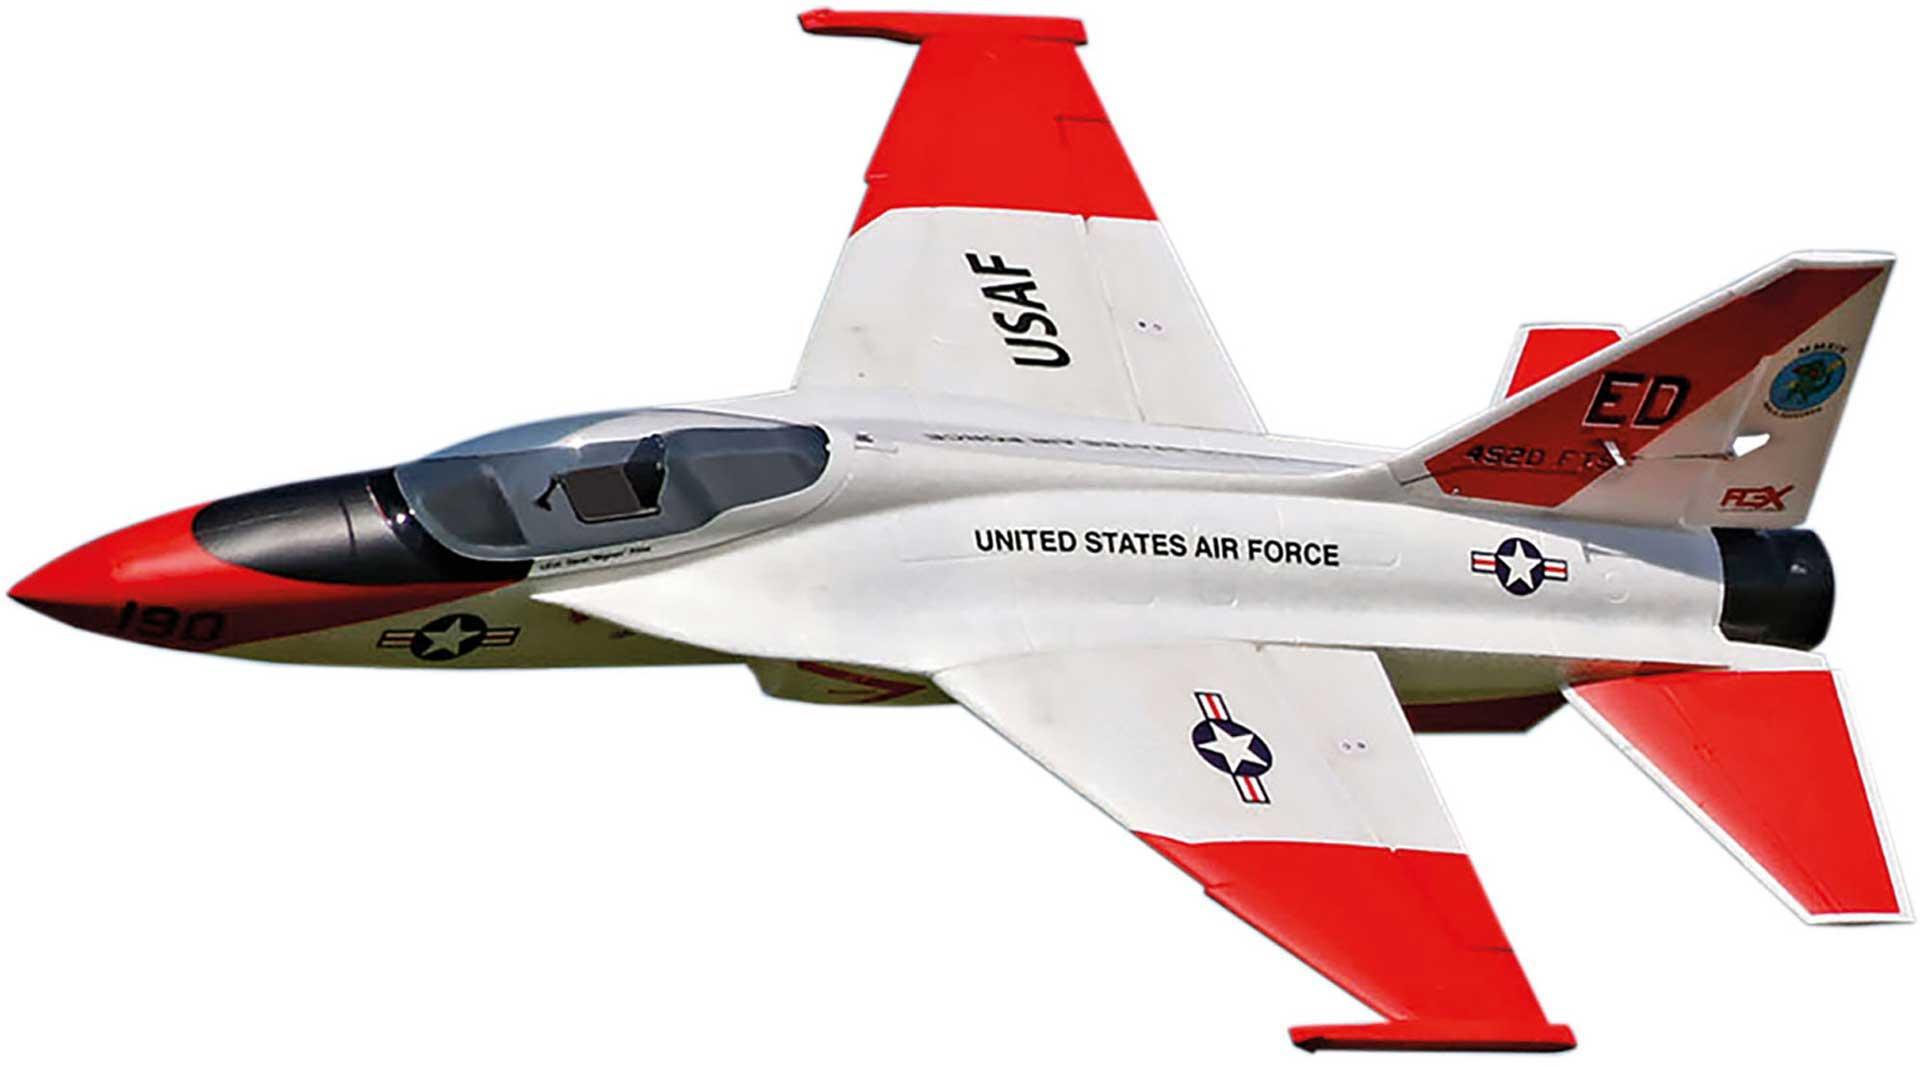 PREMIER AIRCRAFT FLEXJET 90MM EDF IMPELLER JET SUPER PNP ORANGE MIT AURA 8 AFCS